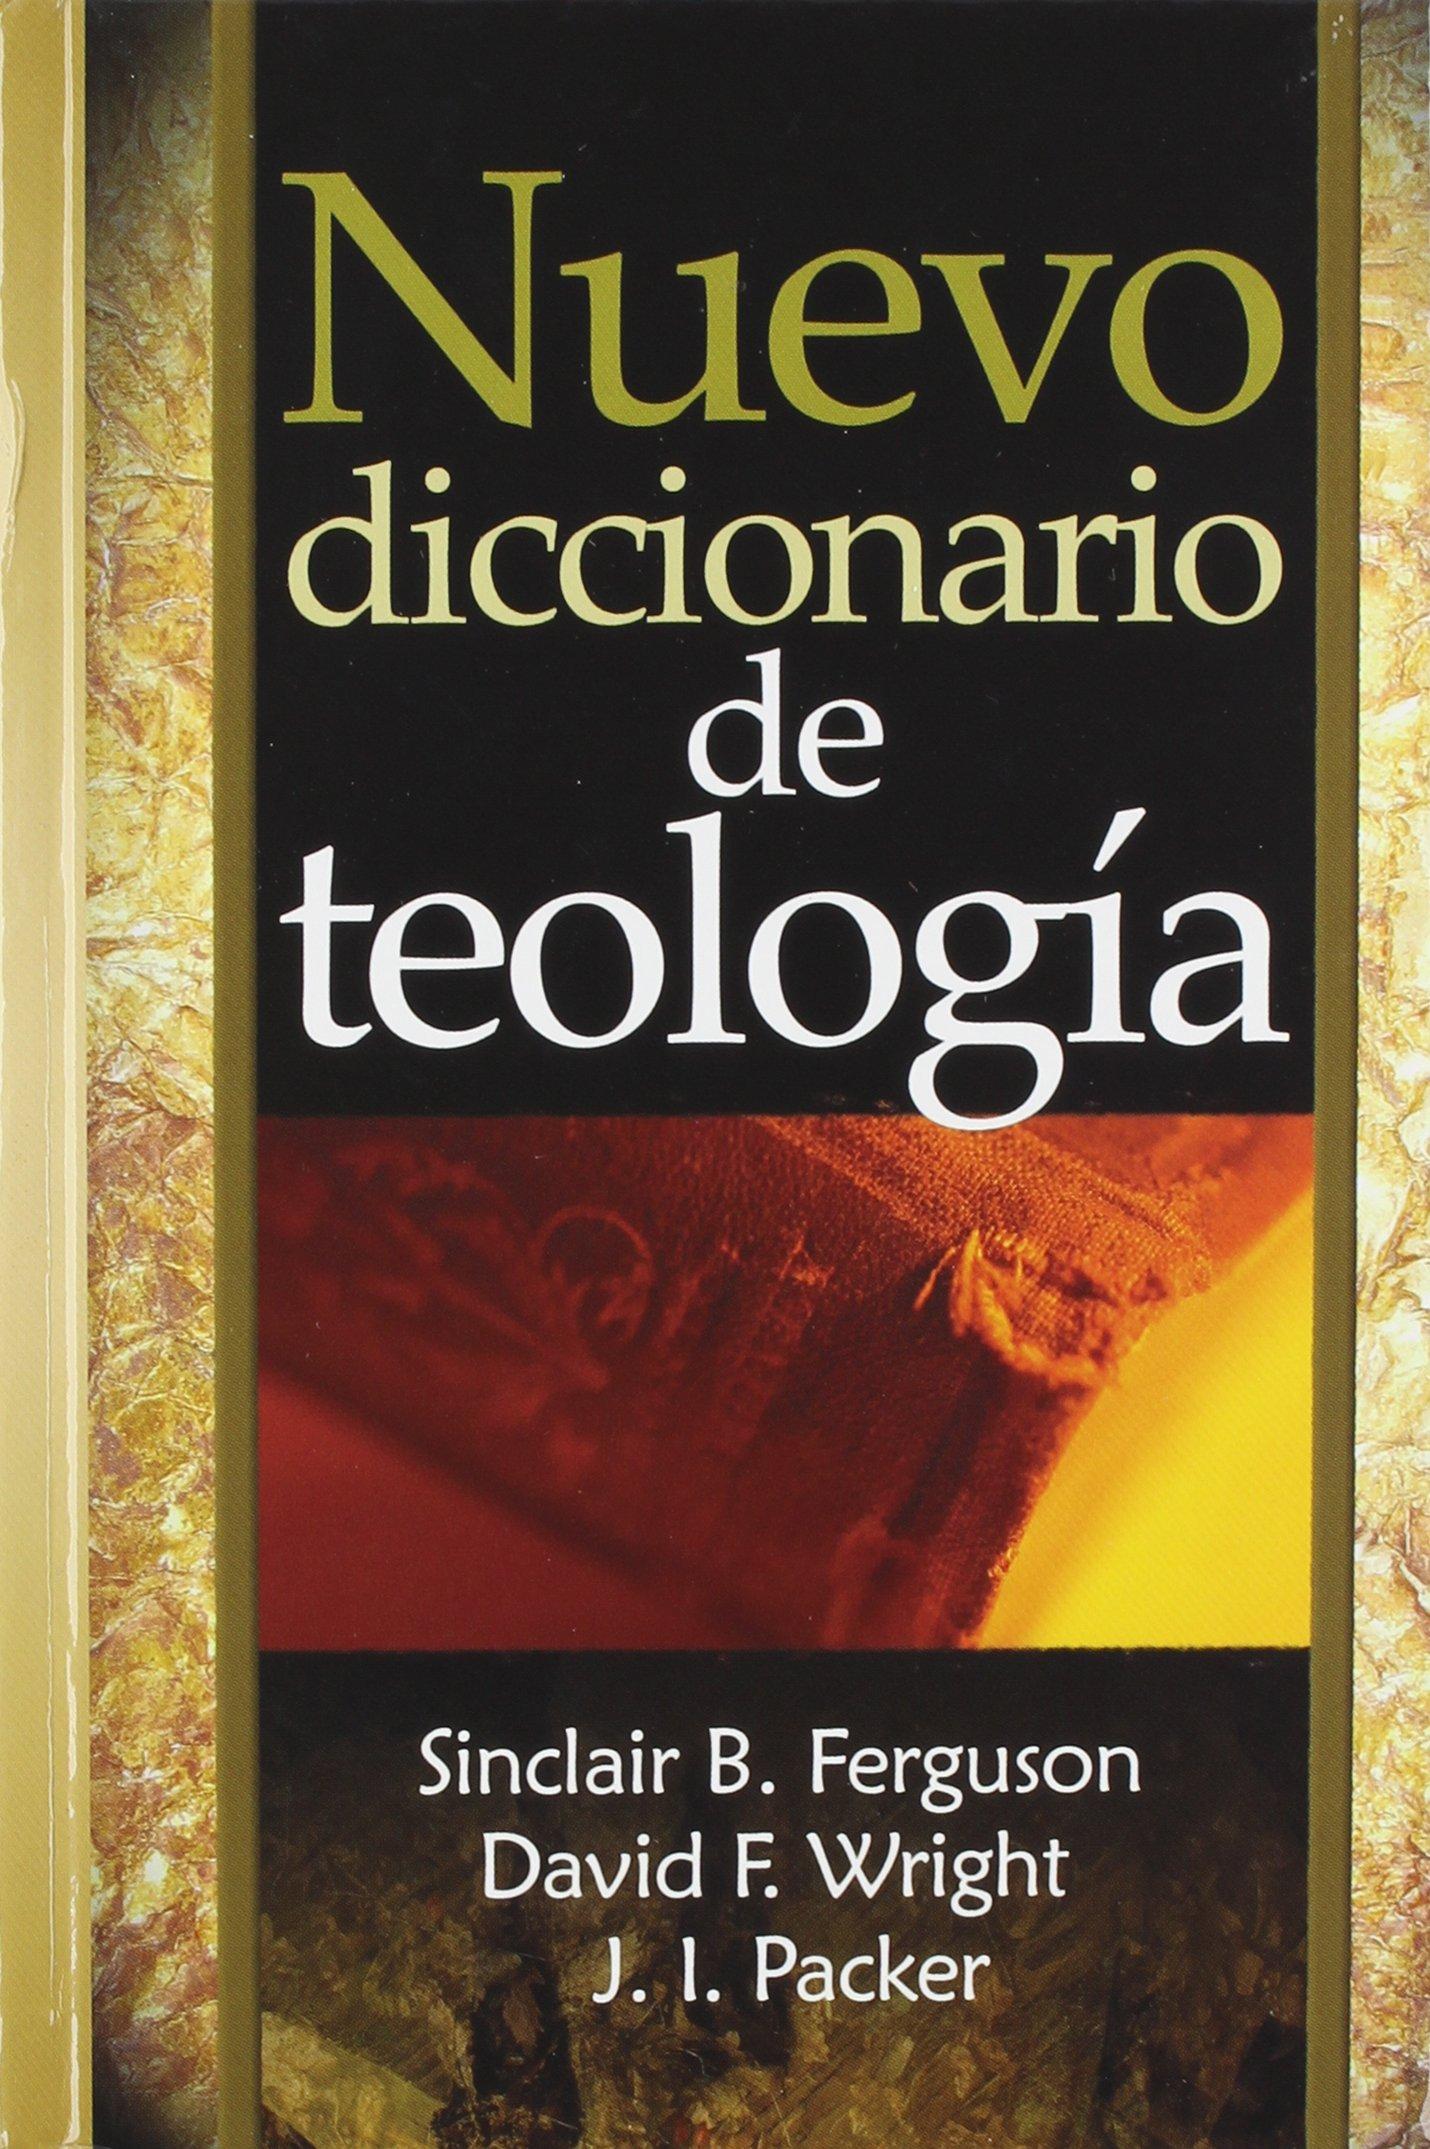 Nuevo Diccionario de Teologia (Spanish Edition): Ferguson, Wright, Packer:  9780311091355: Amazon.com: Books